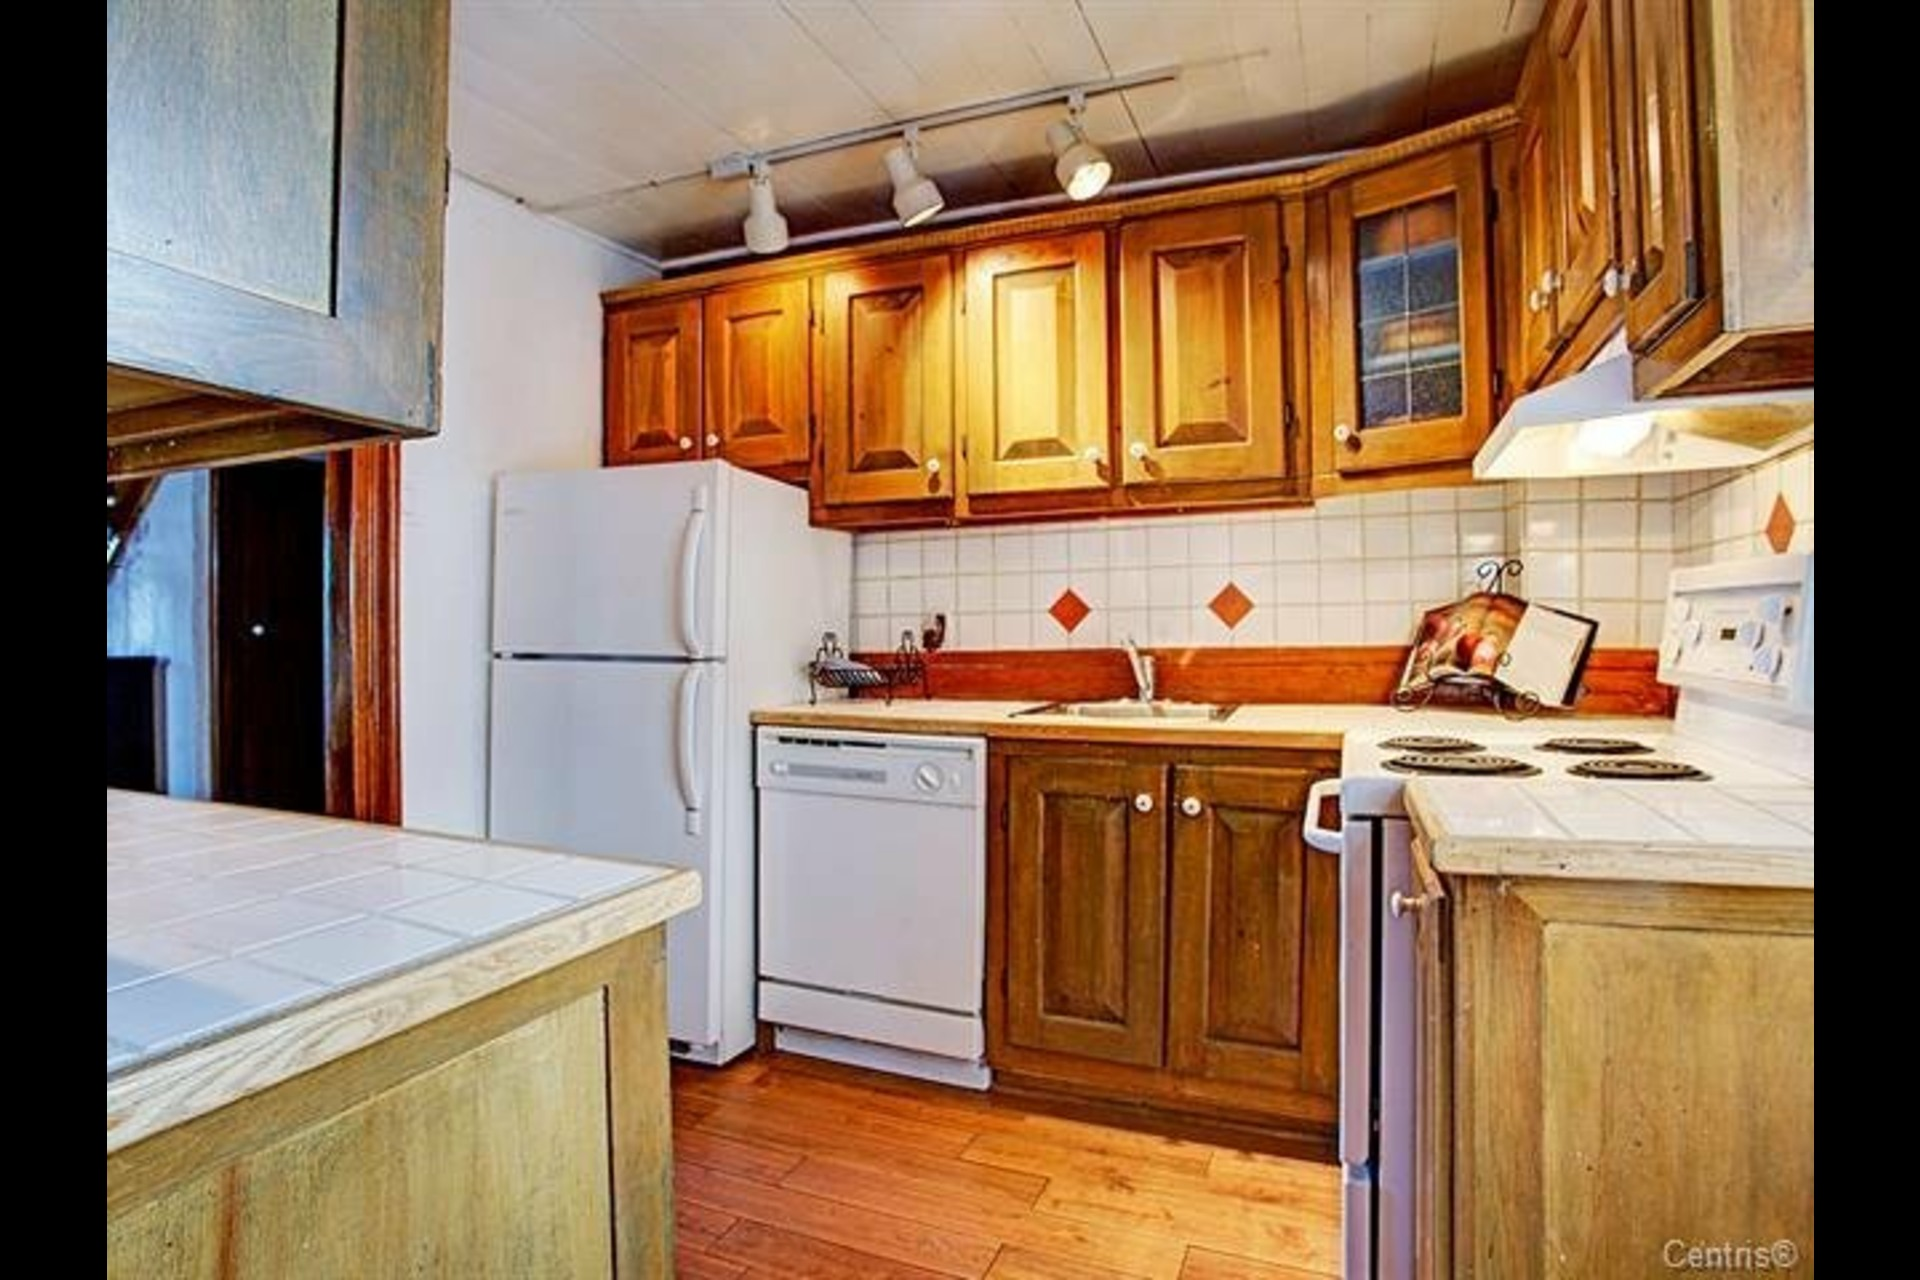 image 8 - MX - Casa sola - MX Para alquiler Vaudreuil-Dorion - 12 habitaciones